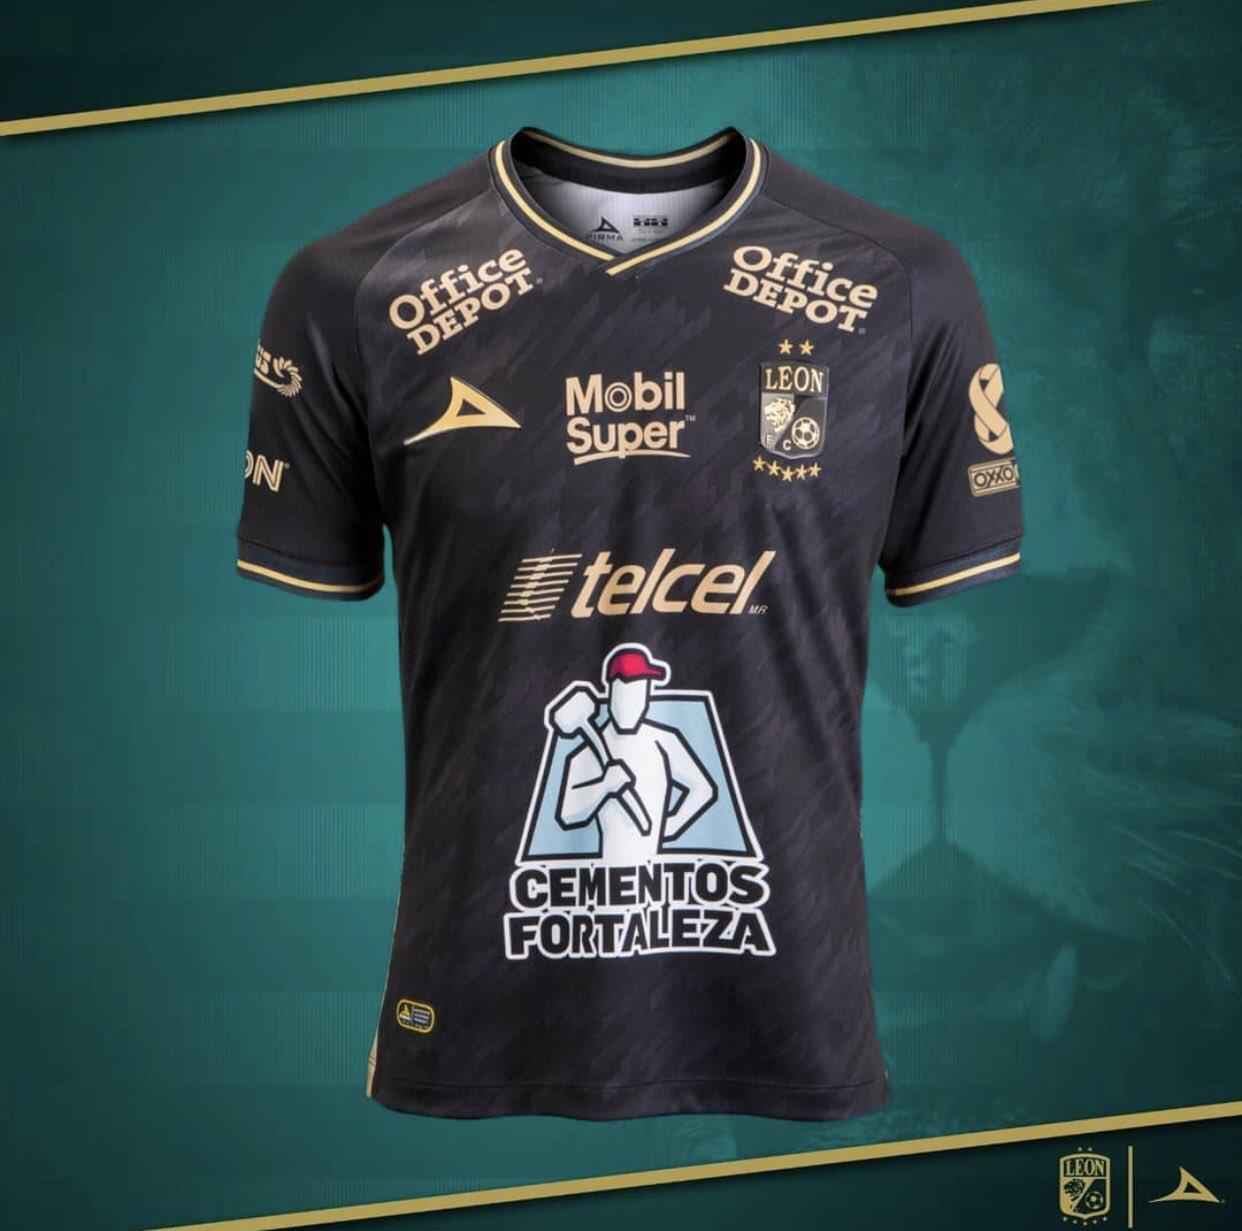 Camisas do Club León 2020-2021 Pirma Reserva